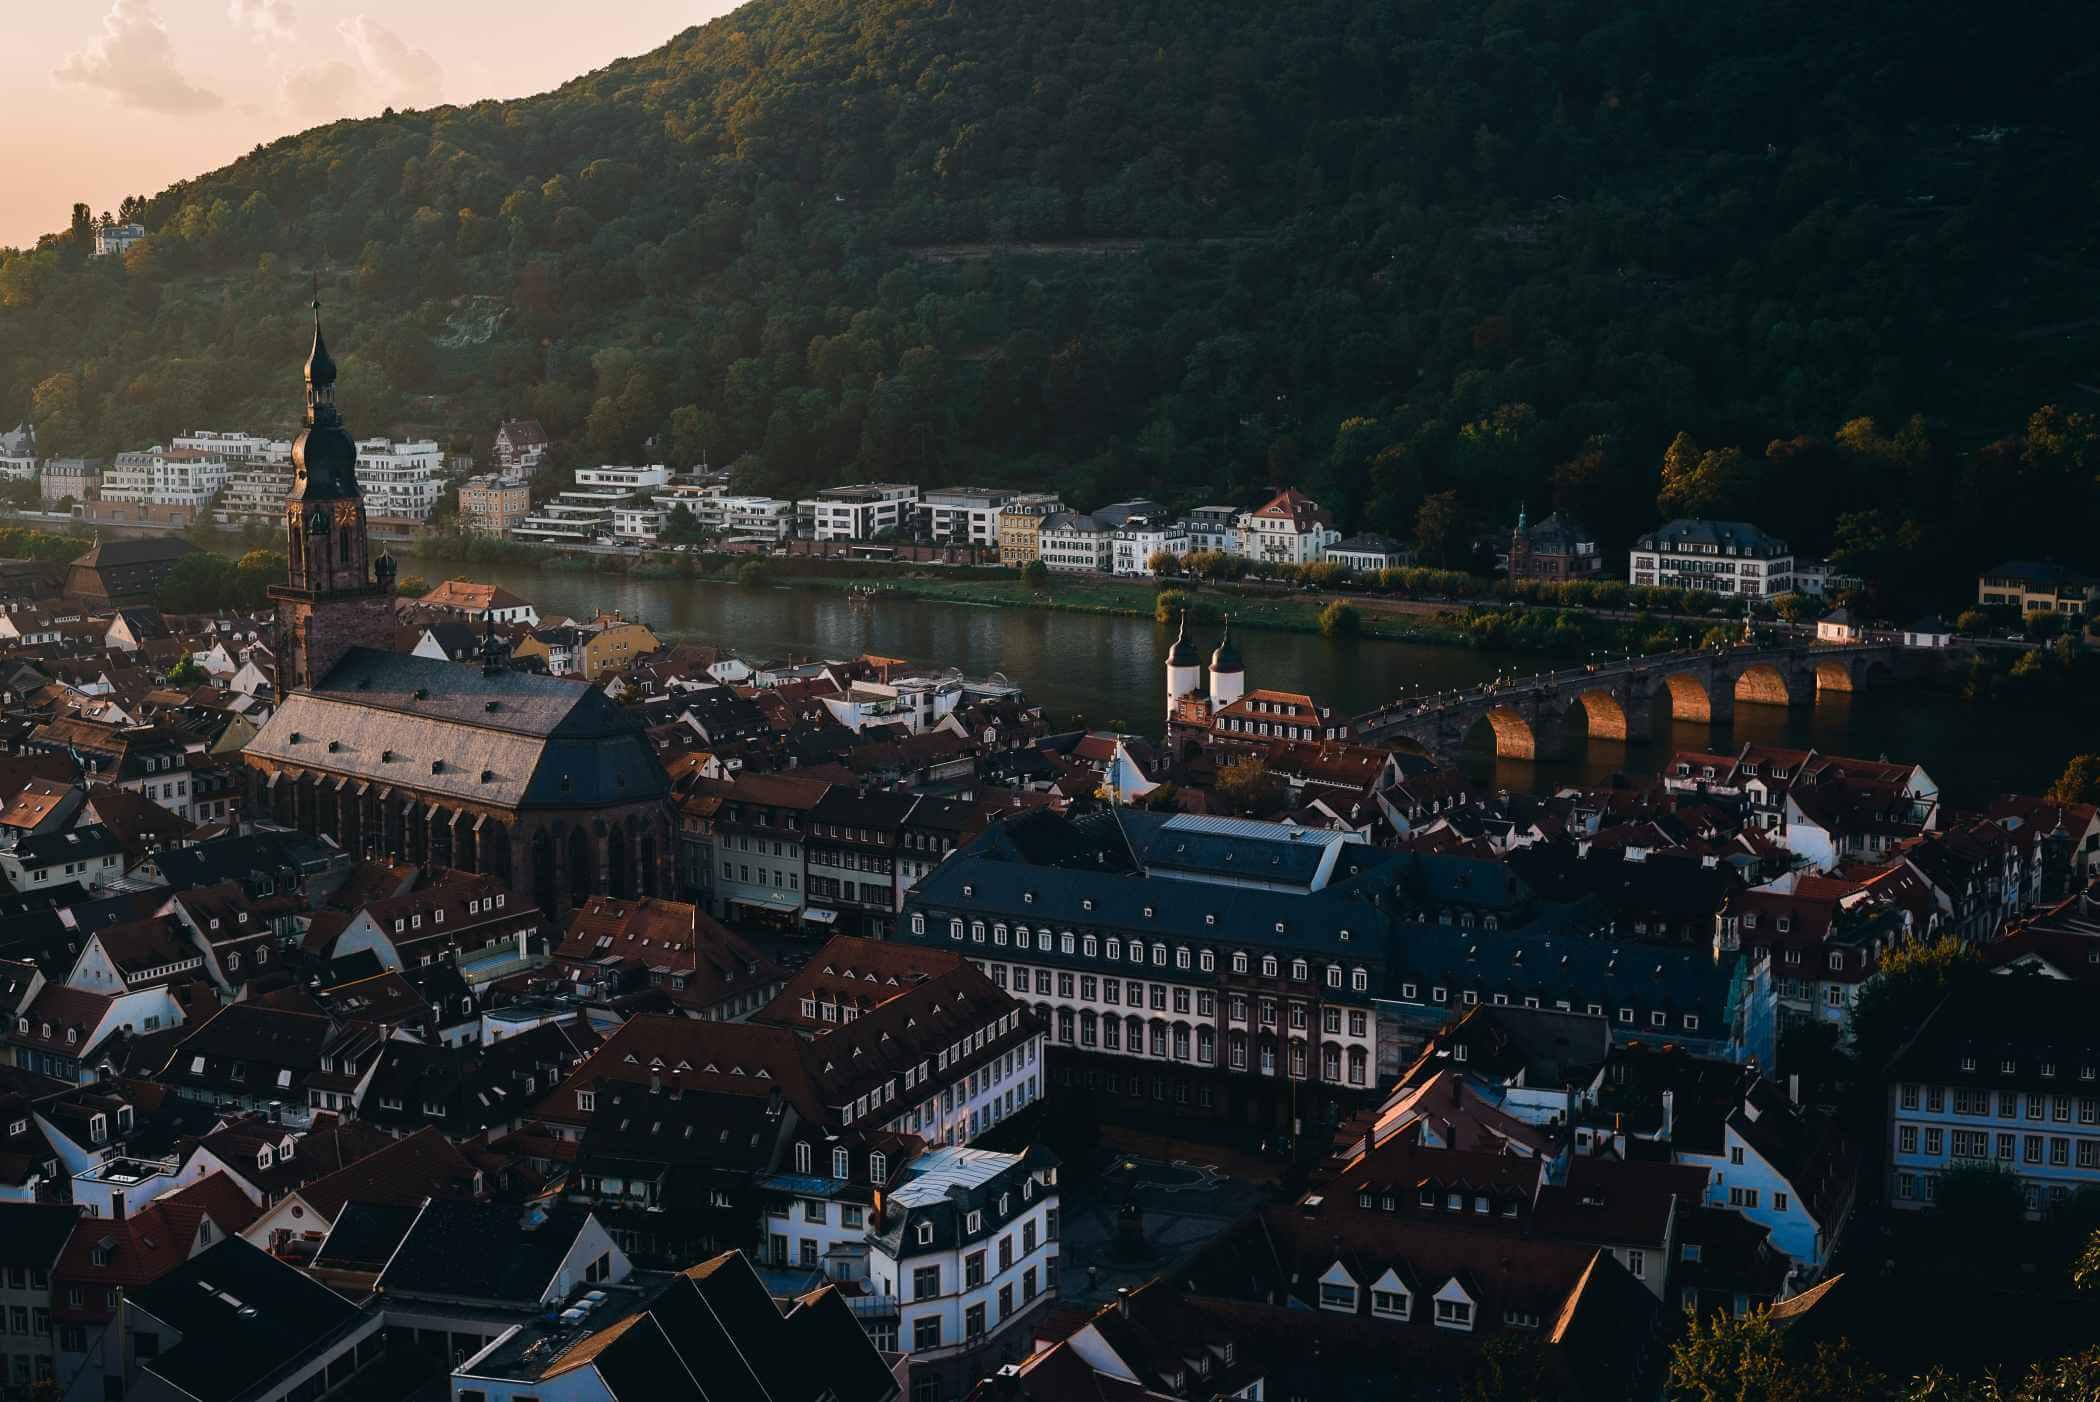 Impression zum Fotokurs in Bonn 2